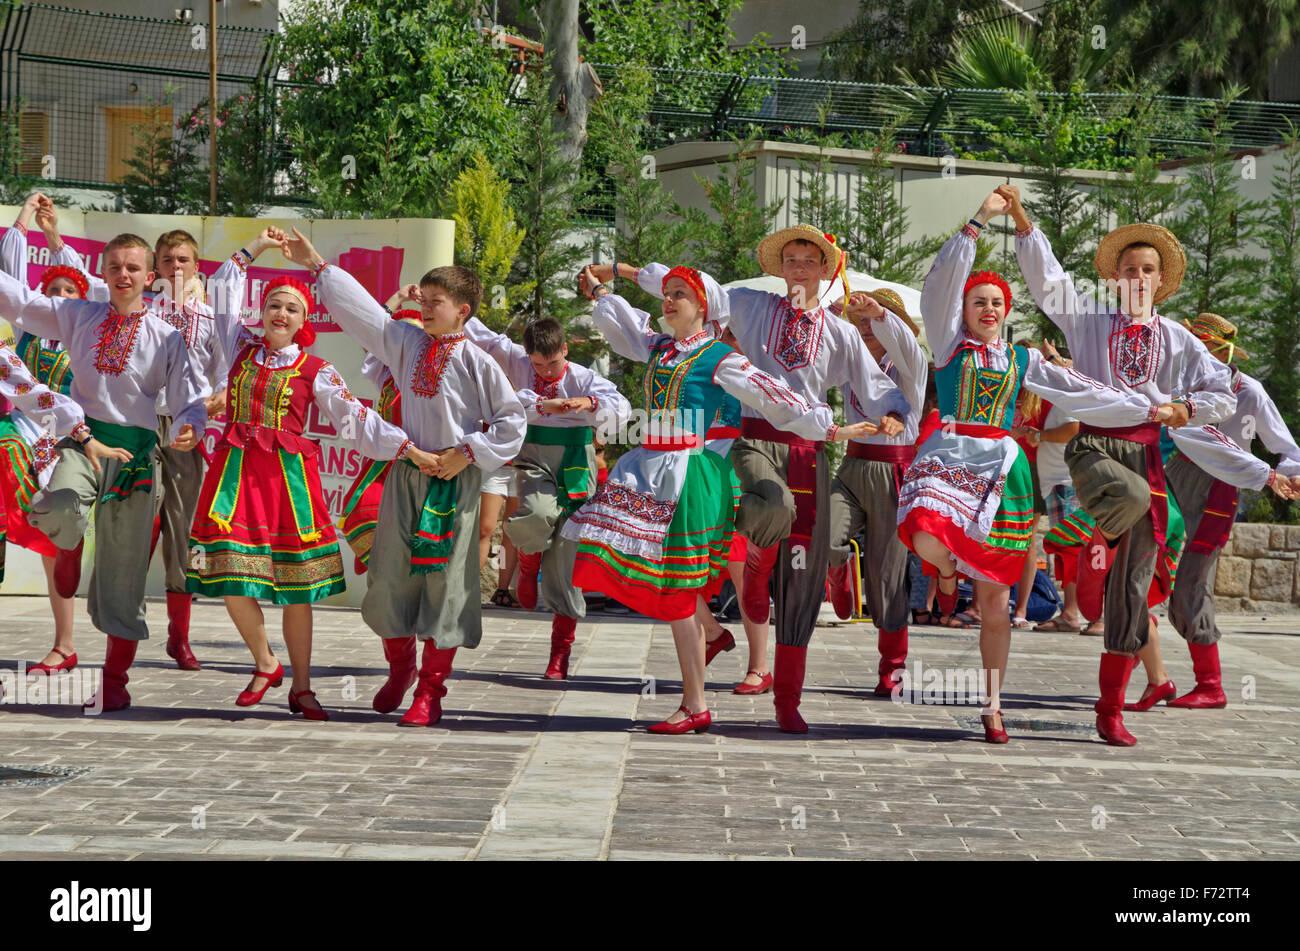 Traditional folk dance festival at Bodrum, Turkey. - Stock Image